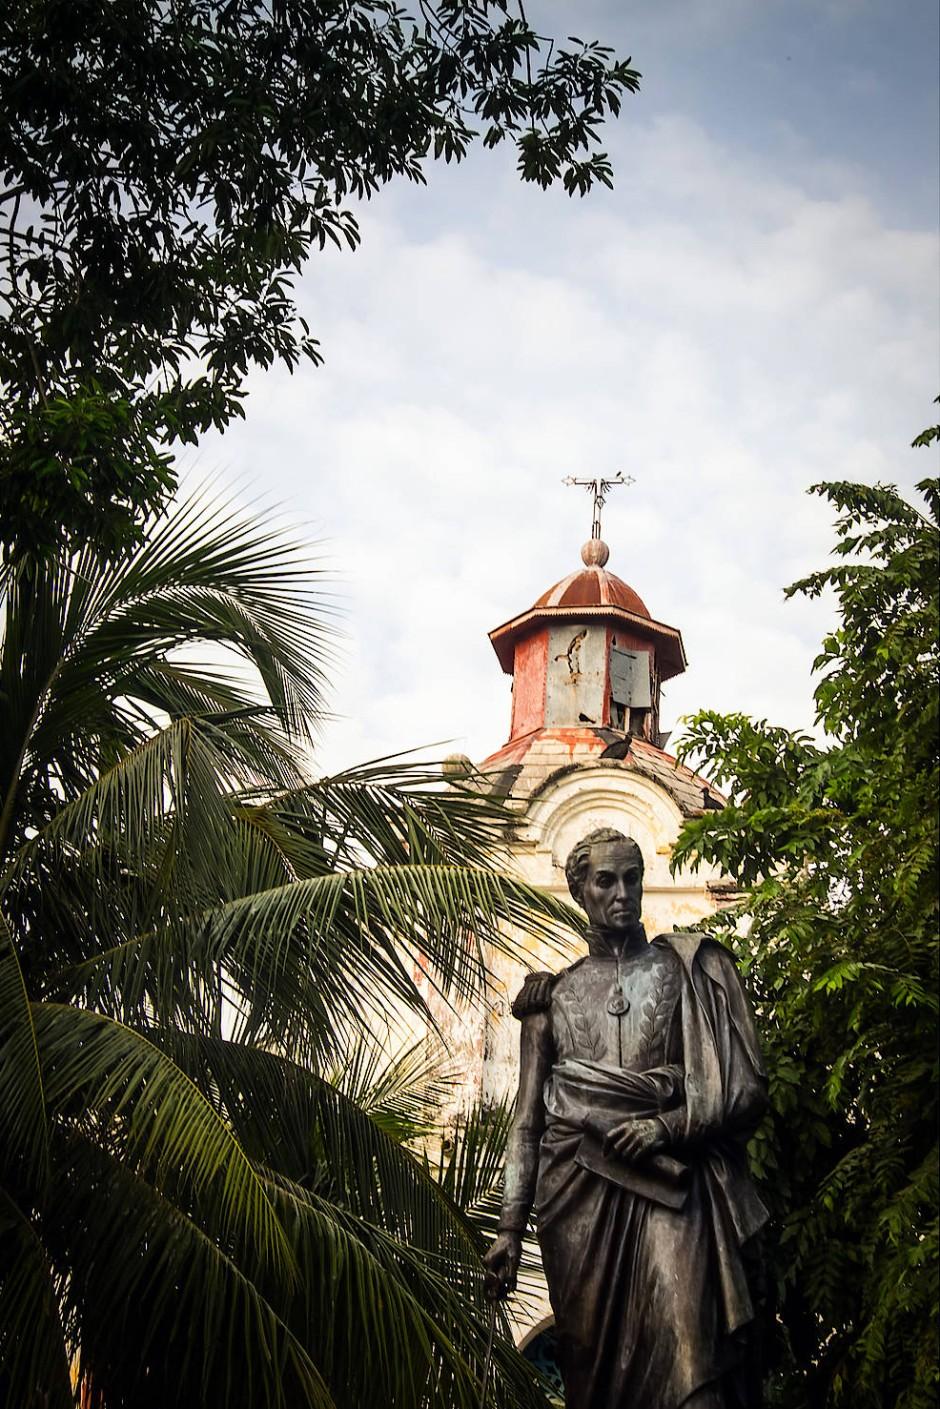 Der Vater des Vaterlandes: Simón Bolívar selbst sagte, dass er den tapferen Momposinos seinen Ruhm verdanke.